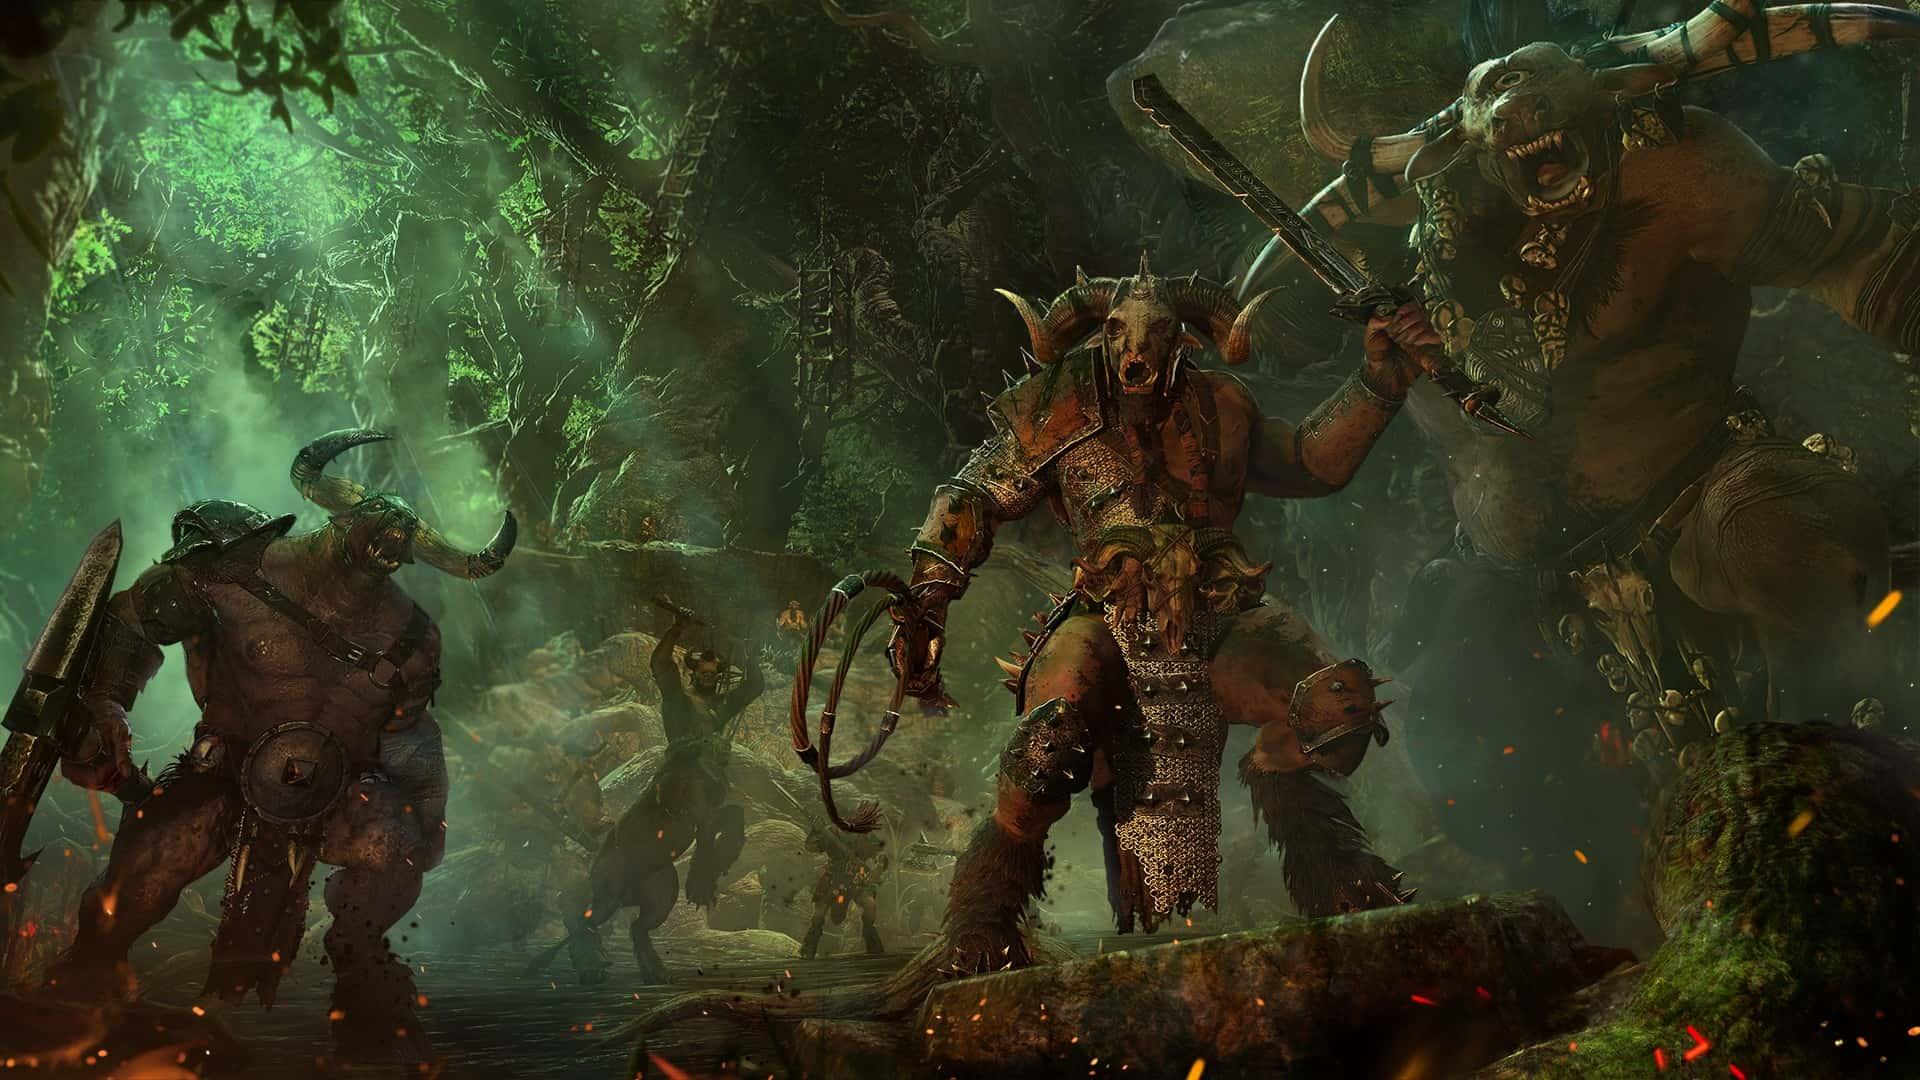 Total War Warhammer Uominibestia immagine in evidenza